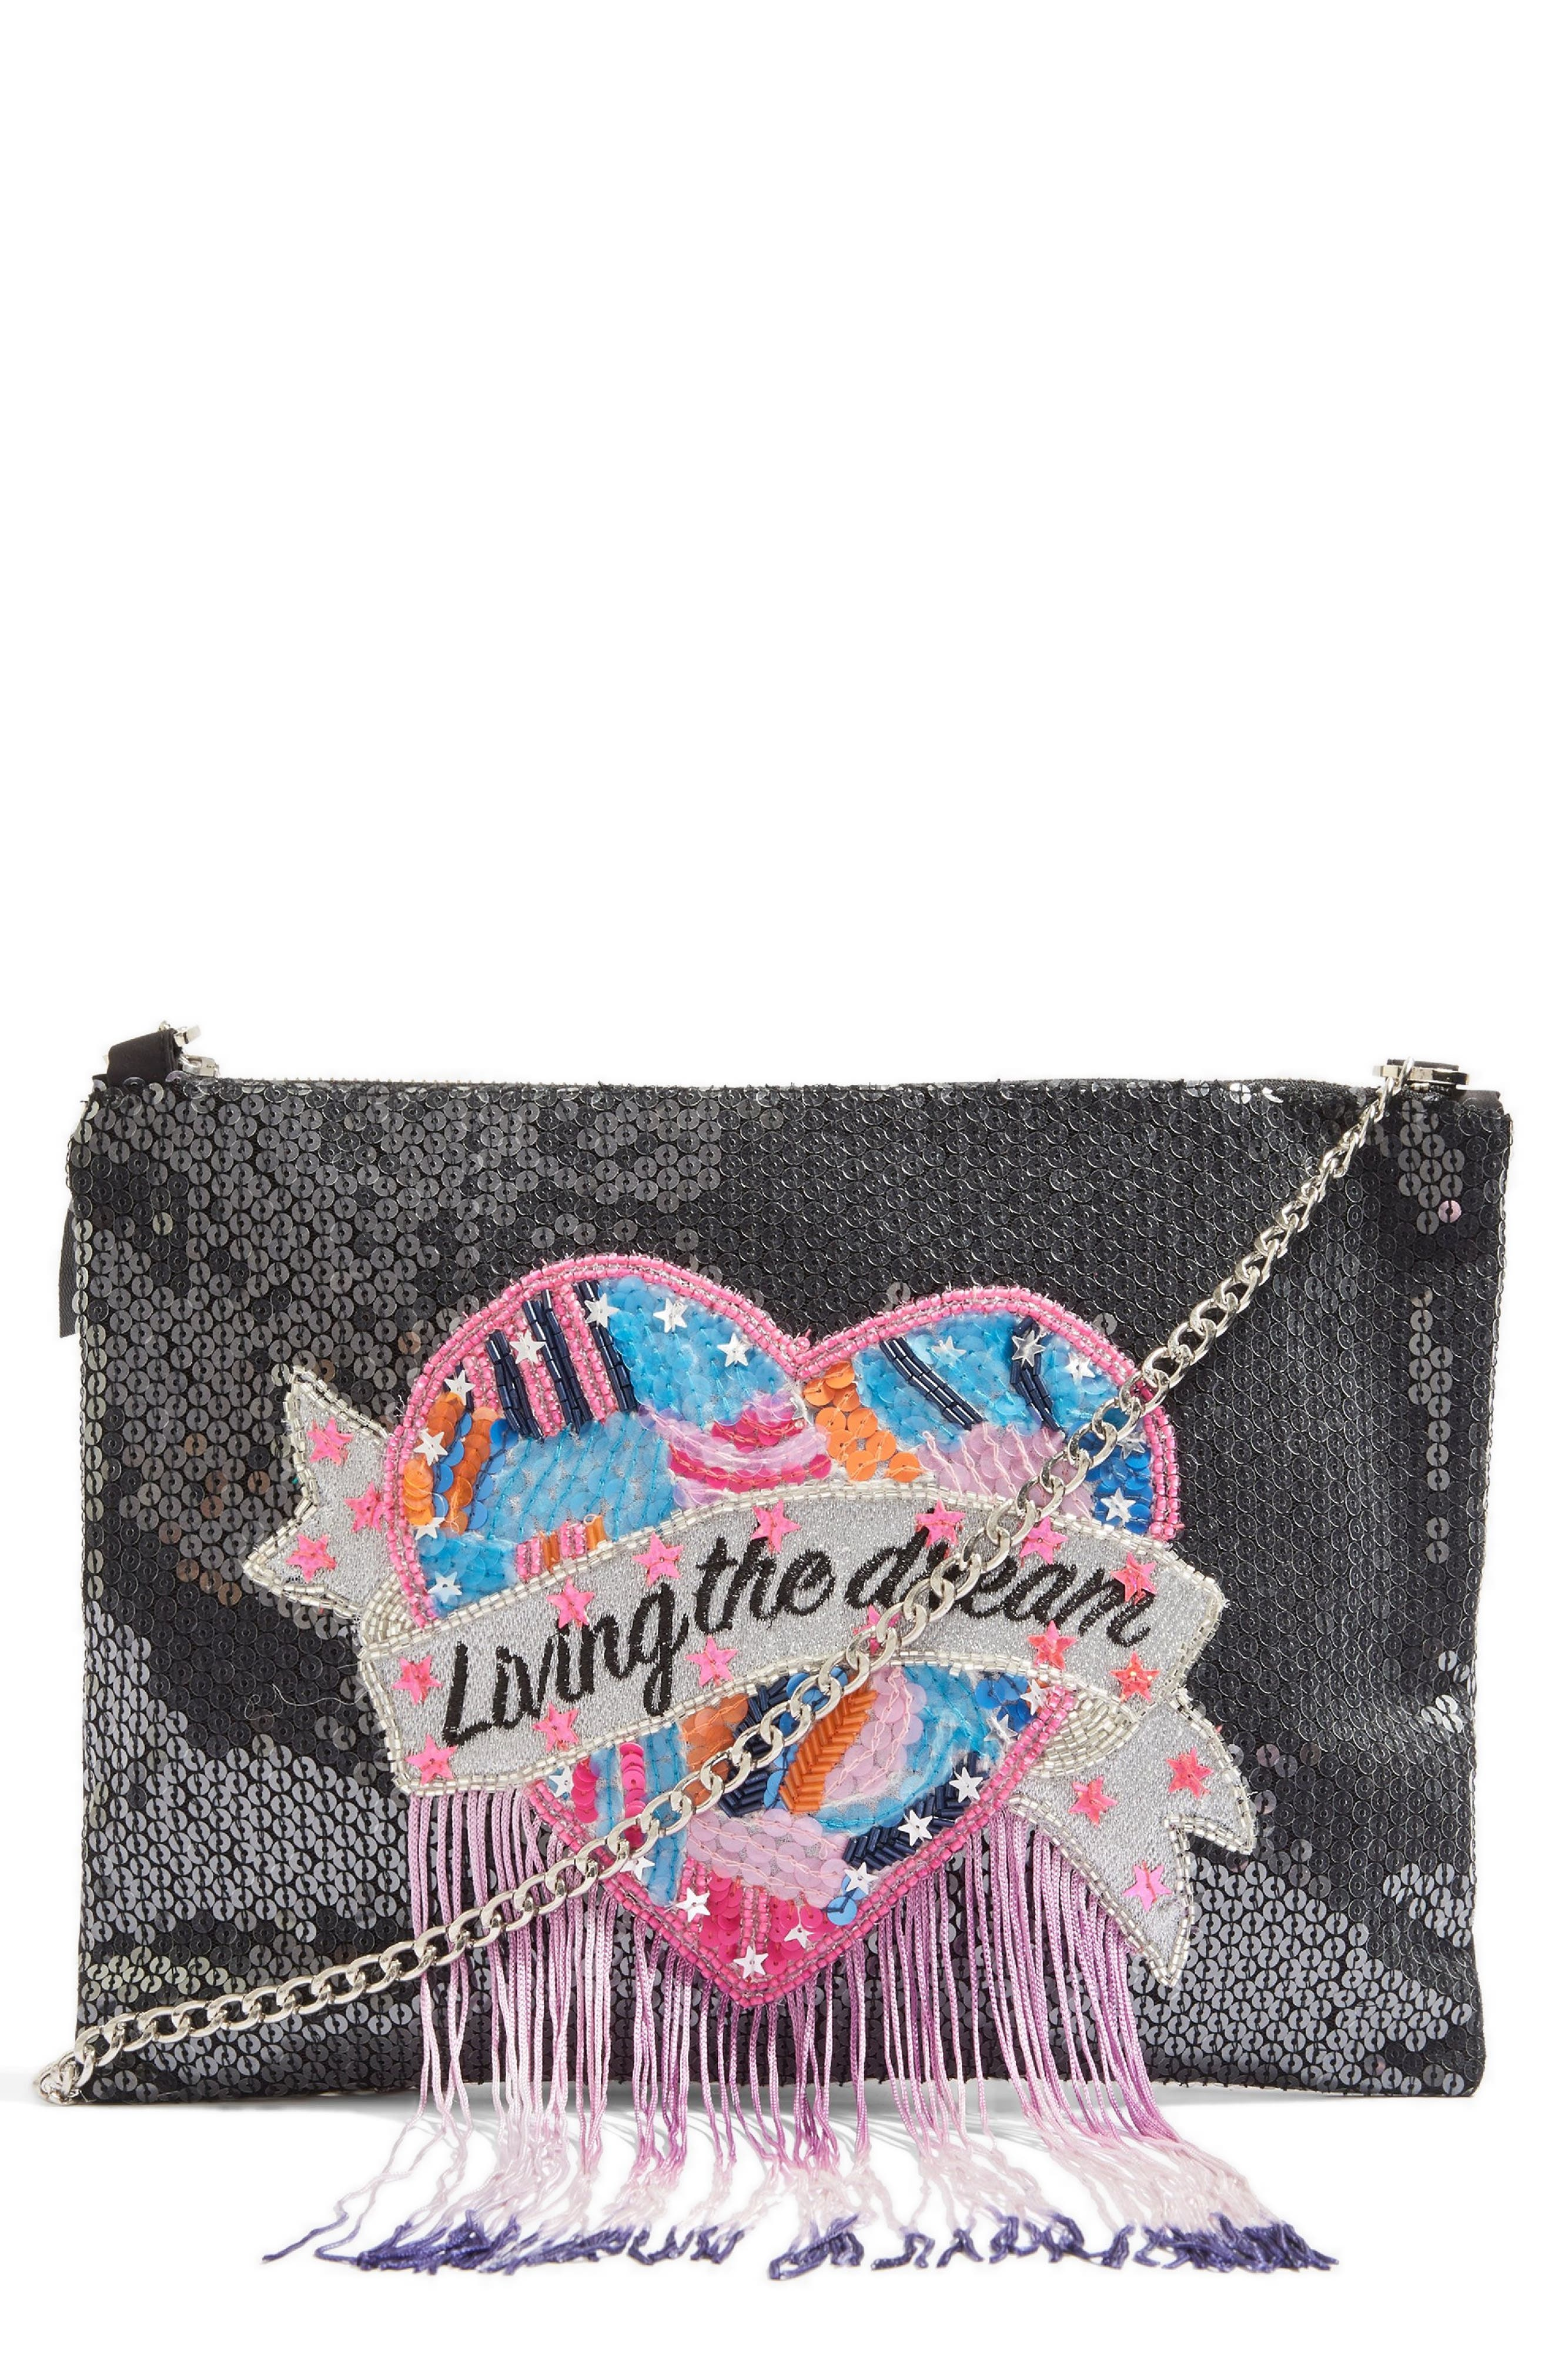 Living The Dream Crossbody Bag,                             Main thumbnail 1, color,                             BLACK MULTI